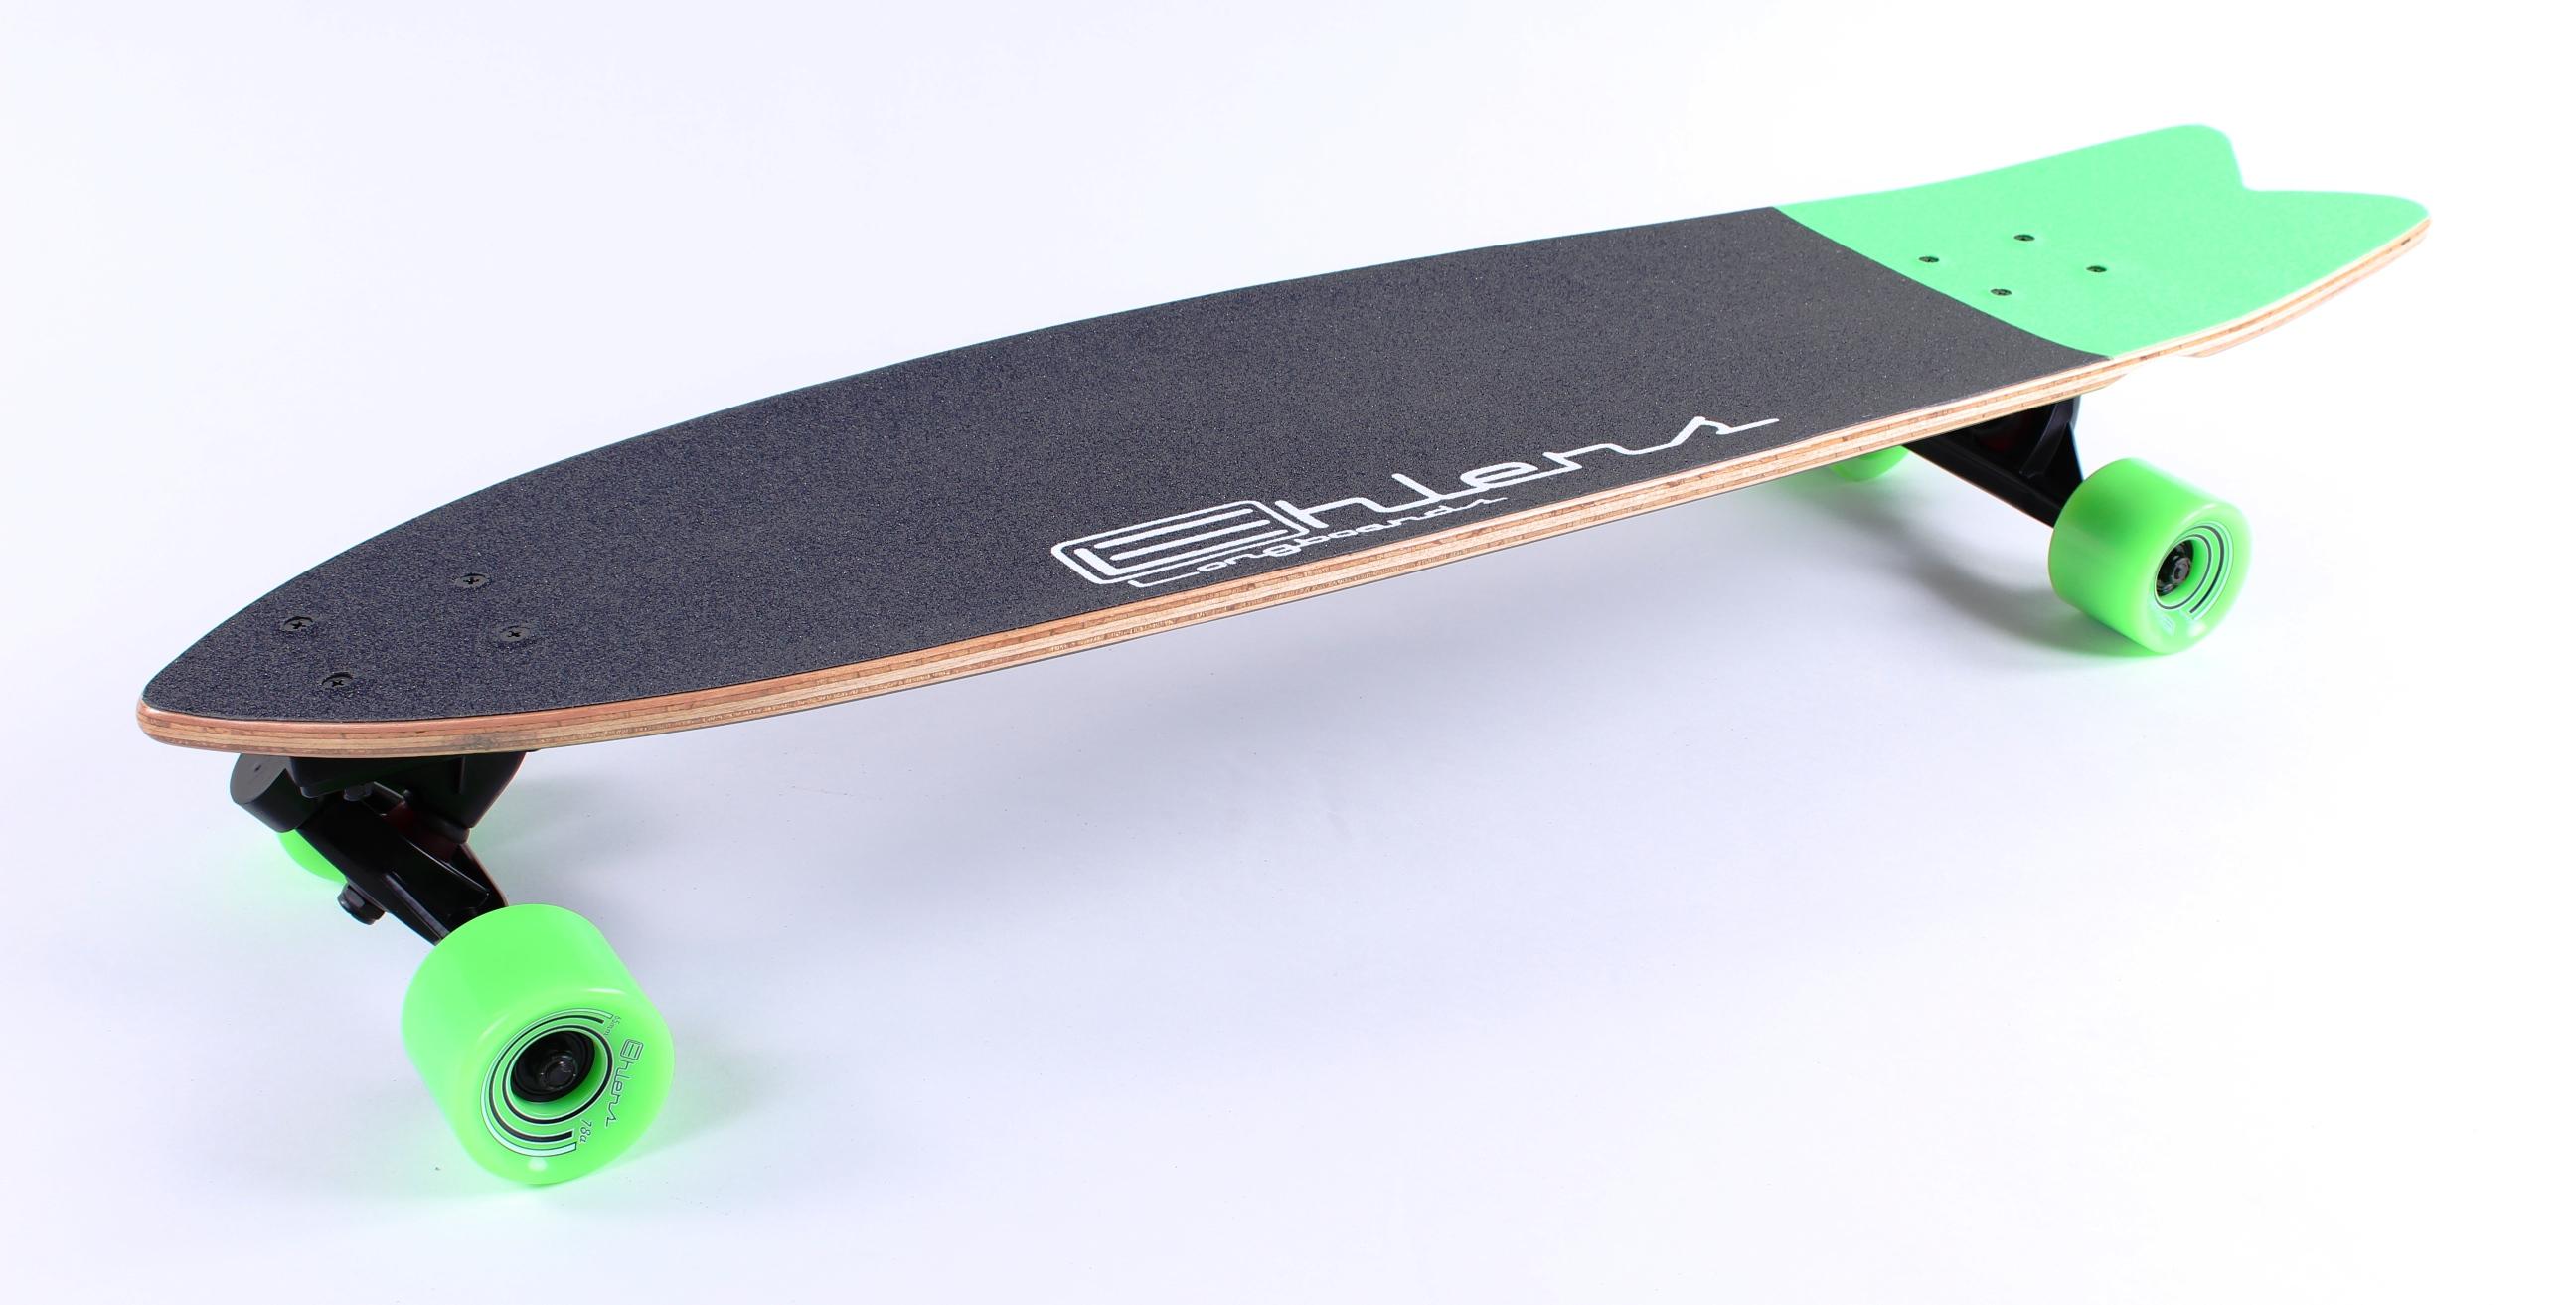 Скейт рыбка лонгборд форма деки фиш теил Fish Tail